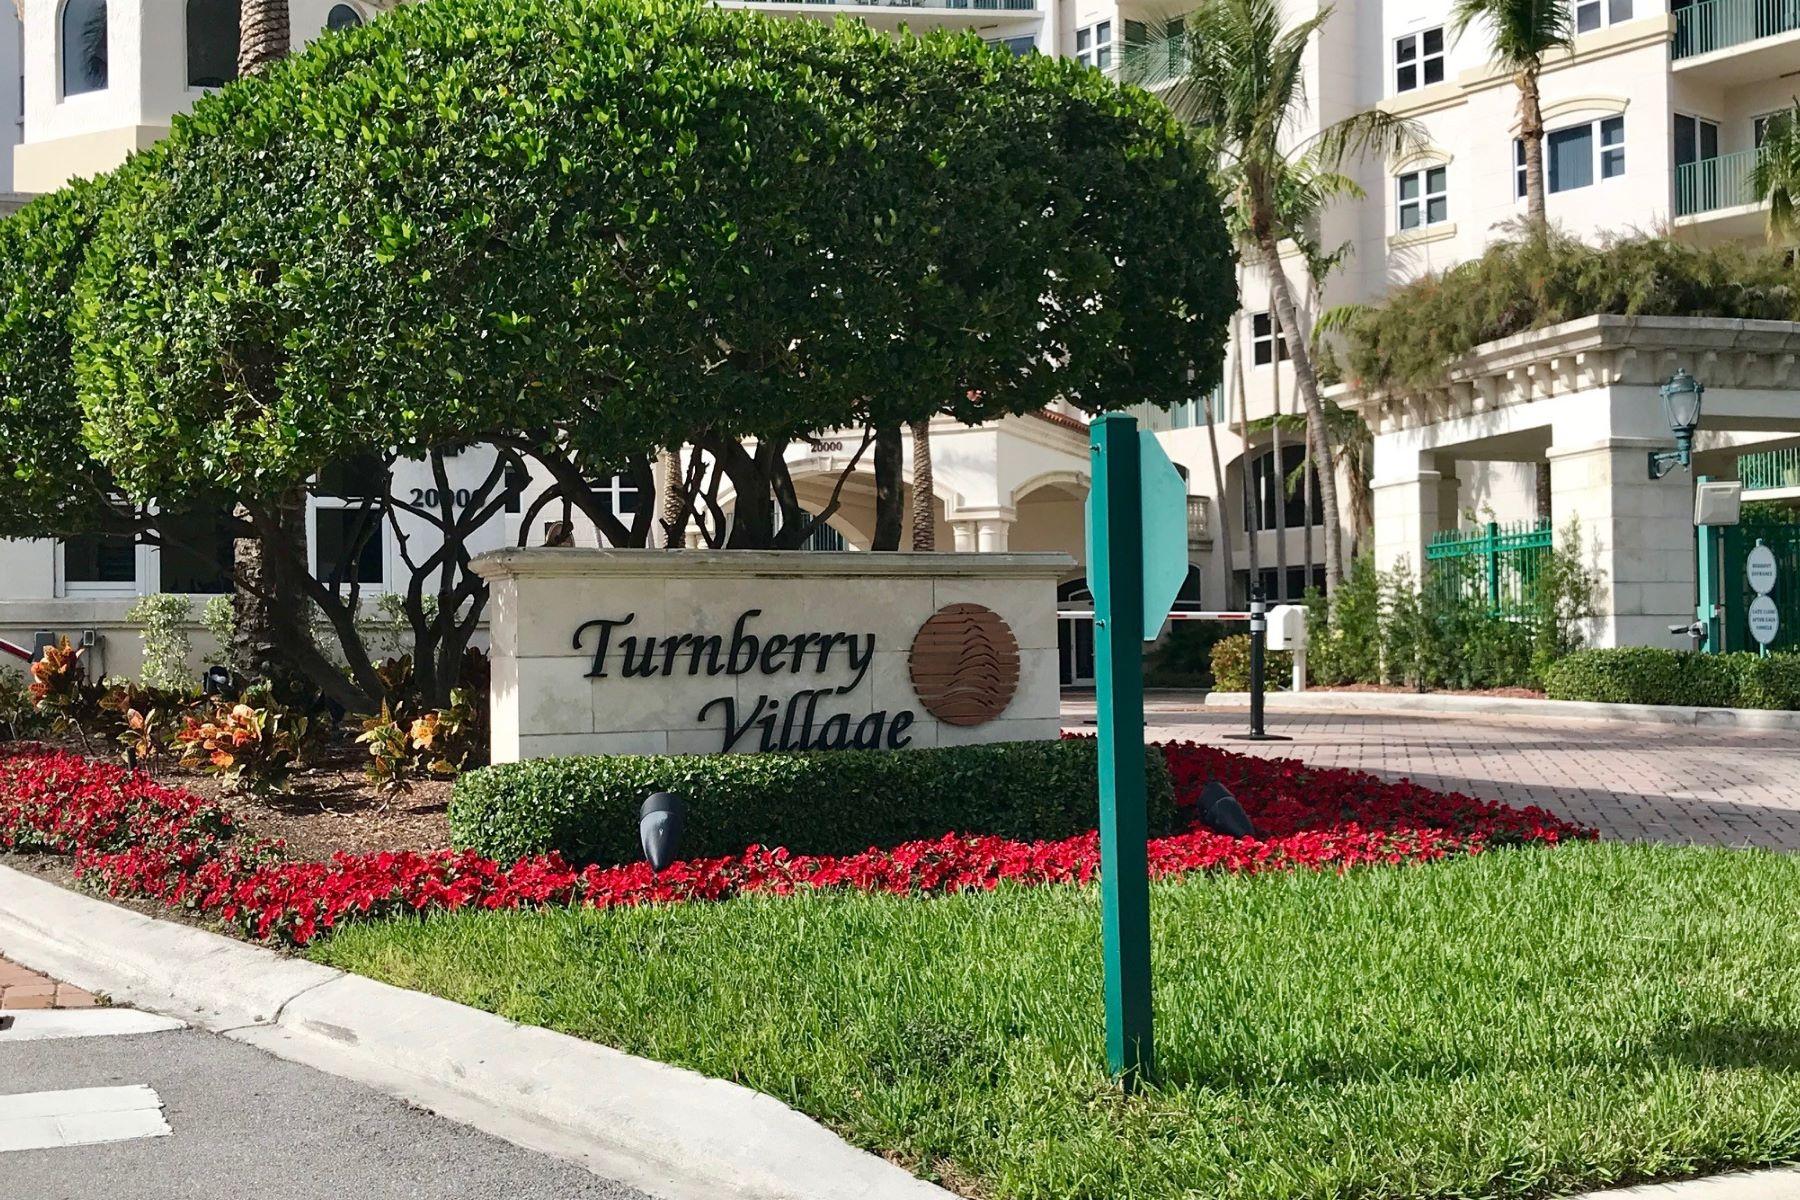 شقة بعمارة للـ Rent في 20000 E Country Club Dr #316 20000 E Country Club Dr 316, Aventura, Florida, 33180 United States